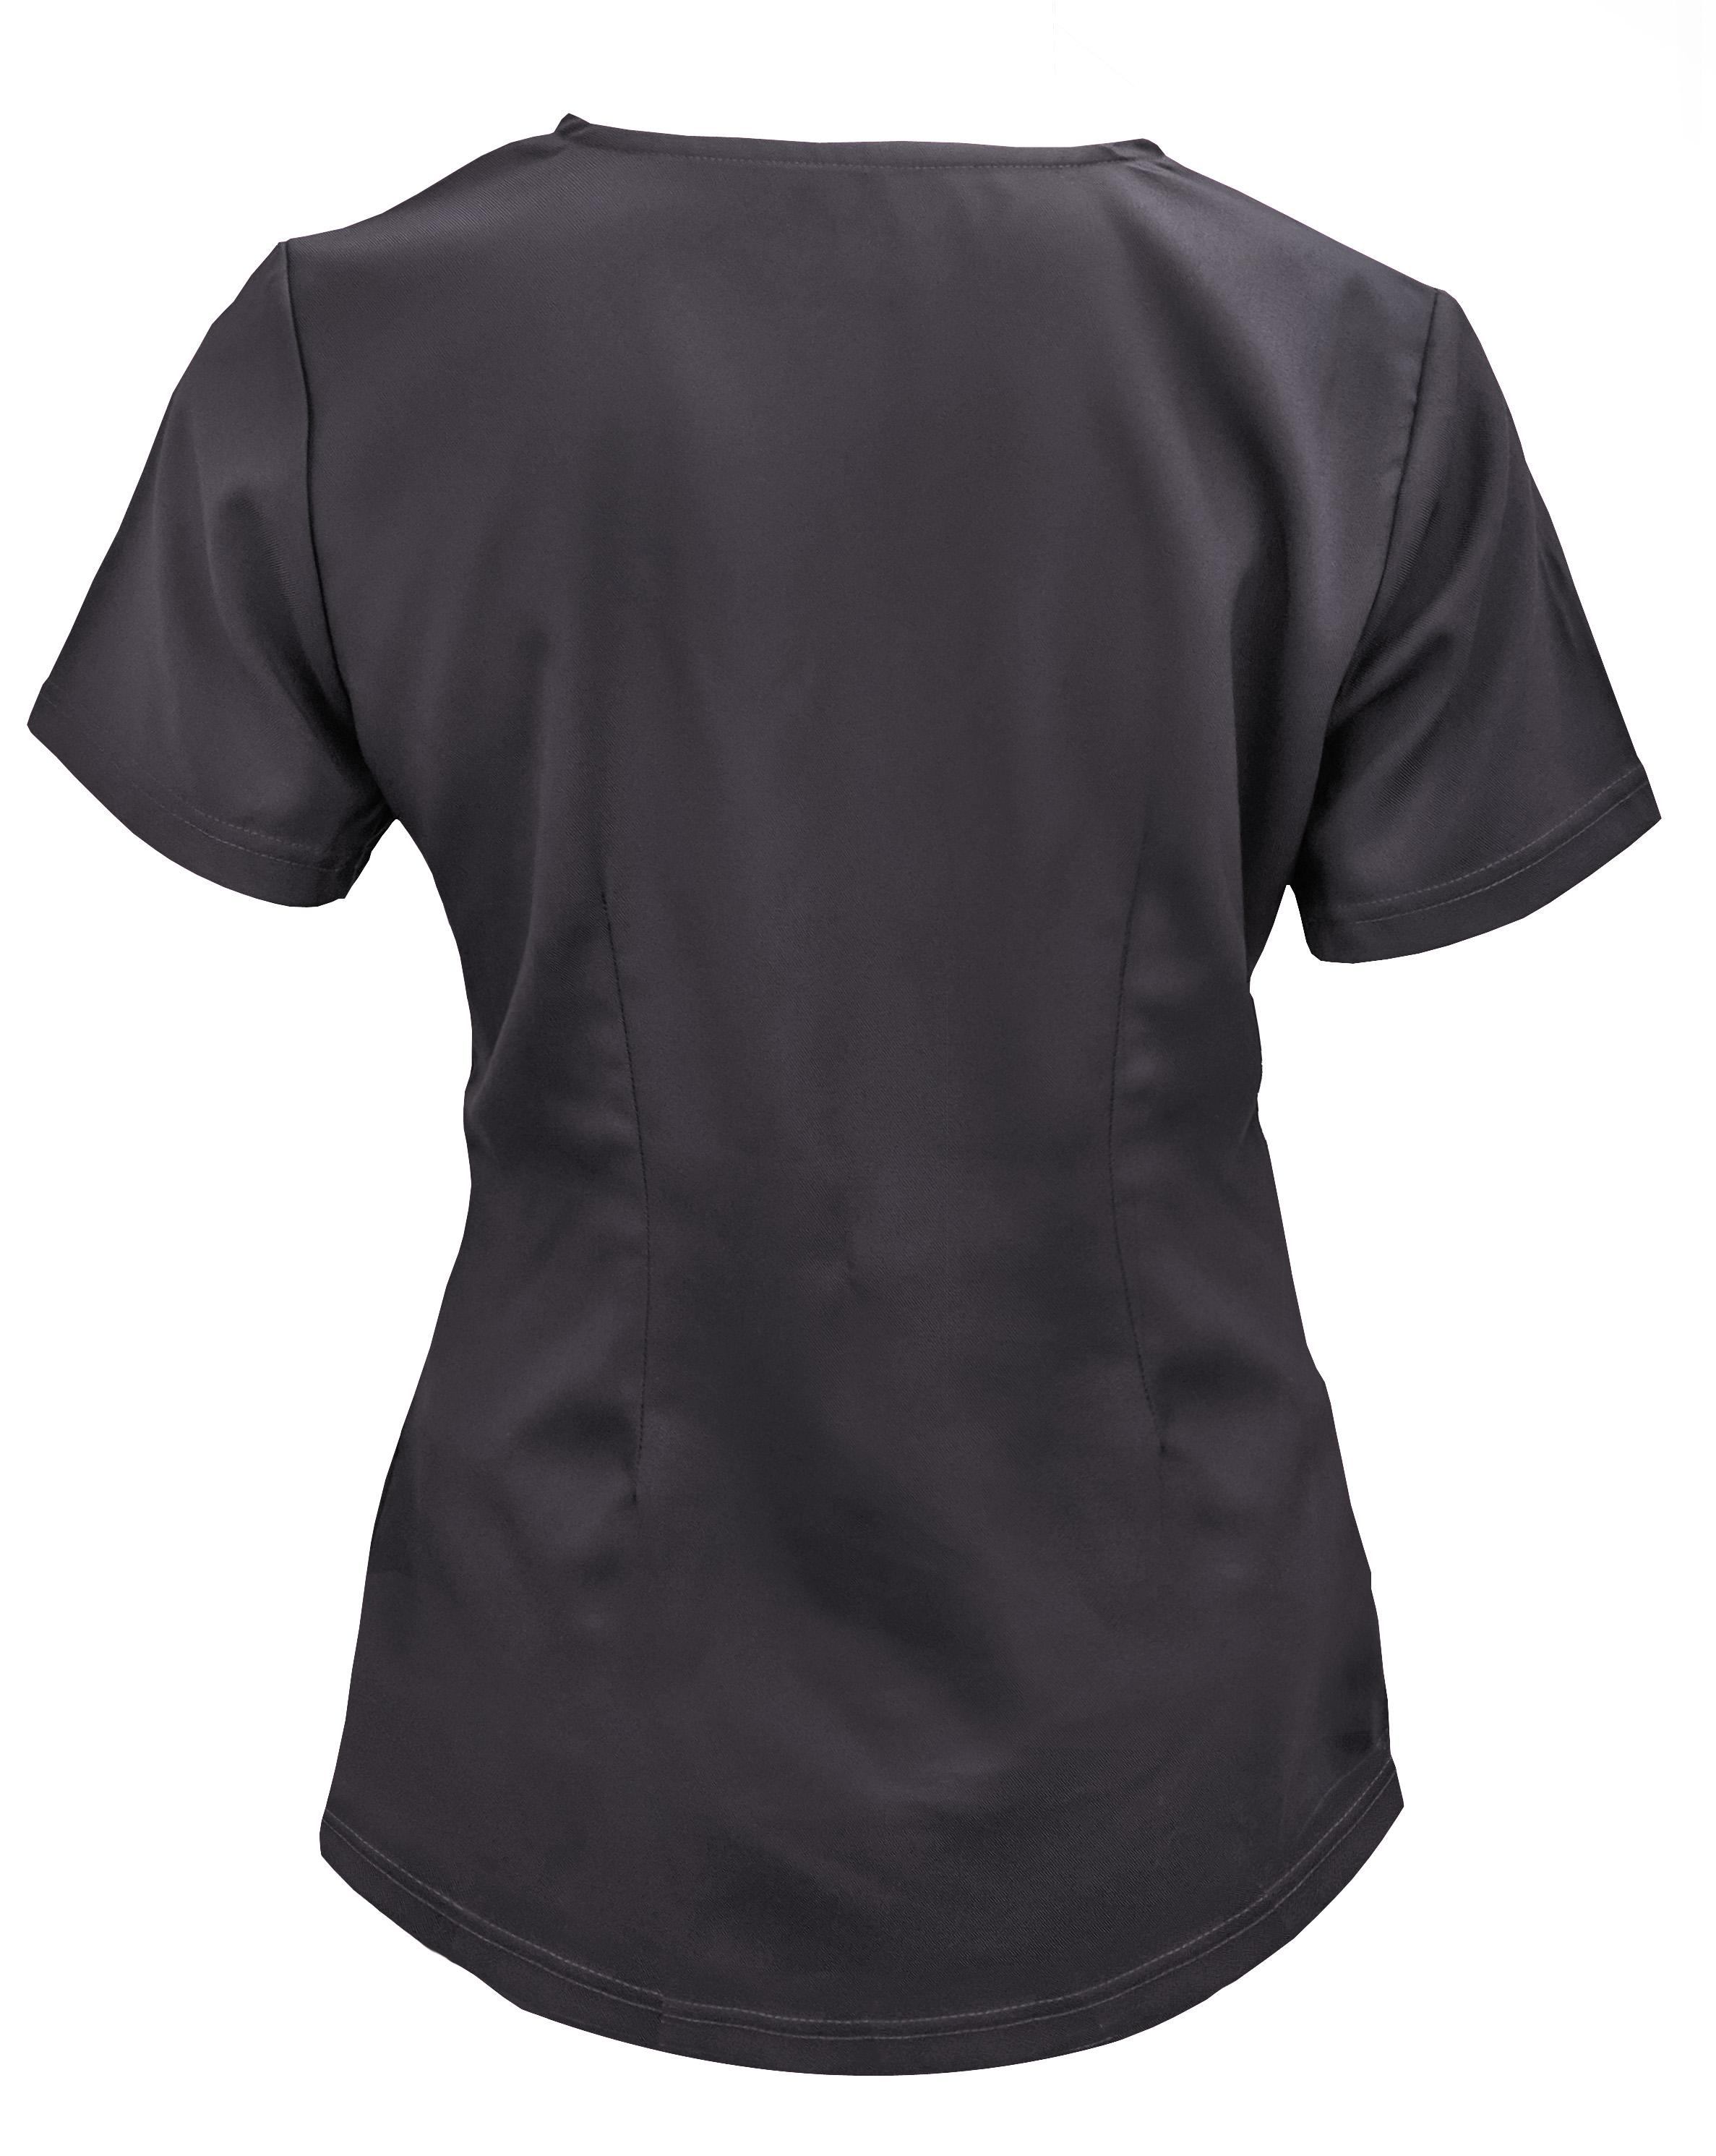 Soulful-Scrubs-Women-039-s-2336-2-Pocket-V-Neck-Scrub-Top miniature 17